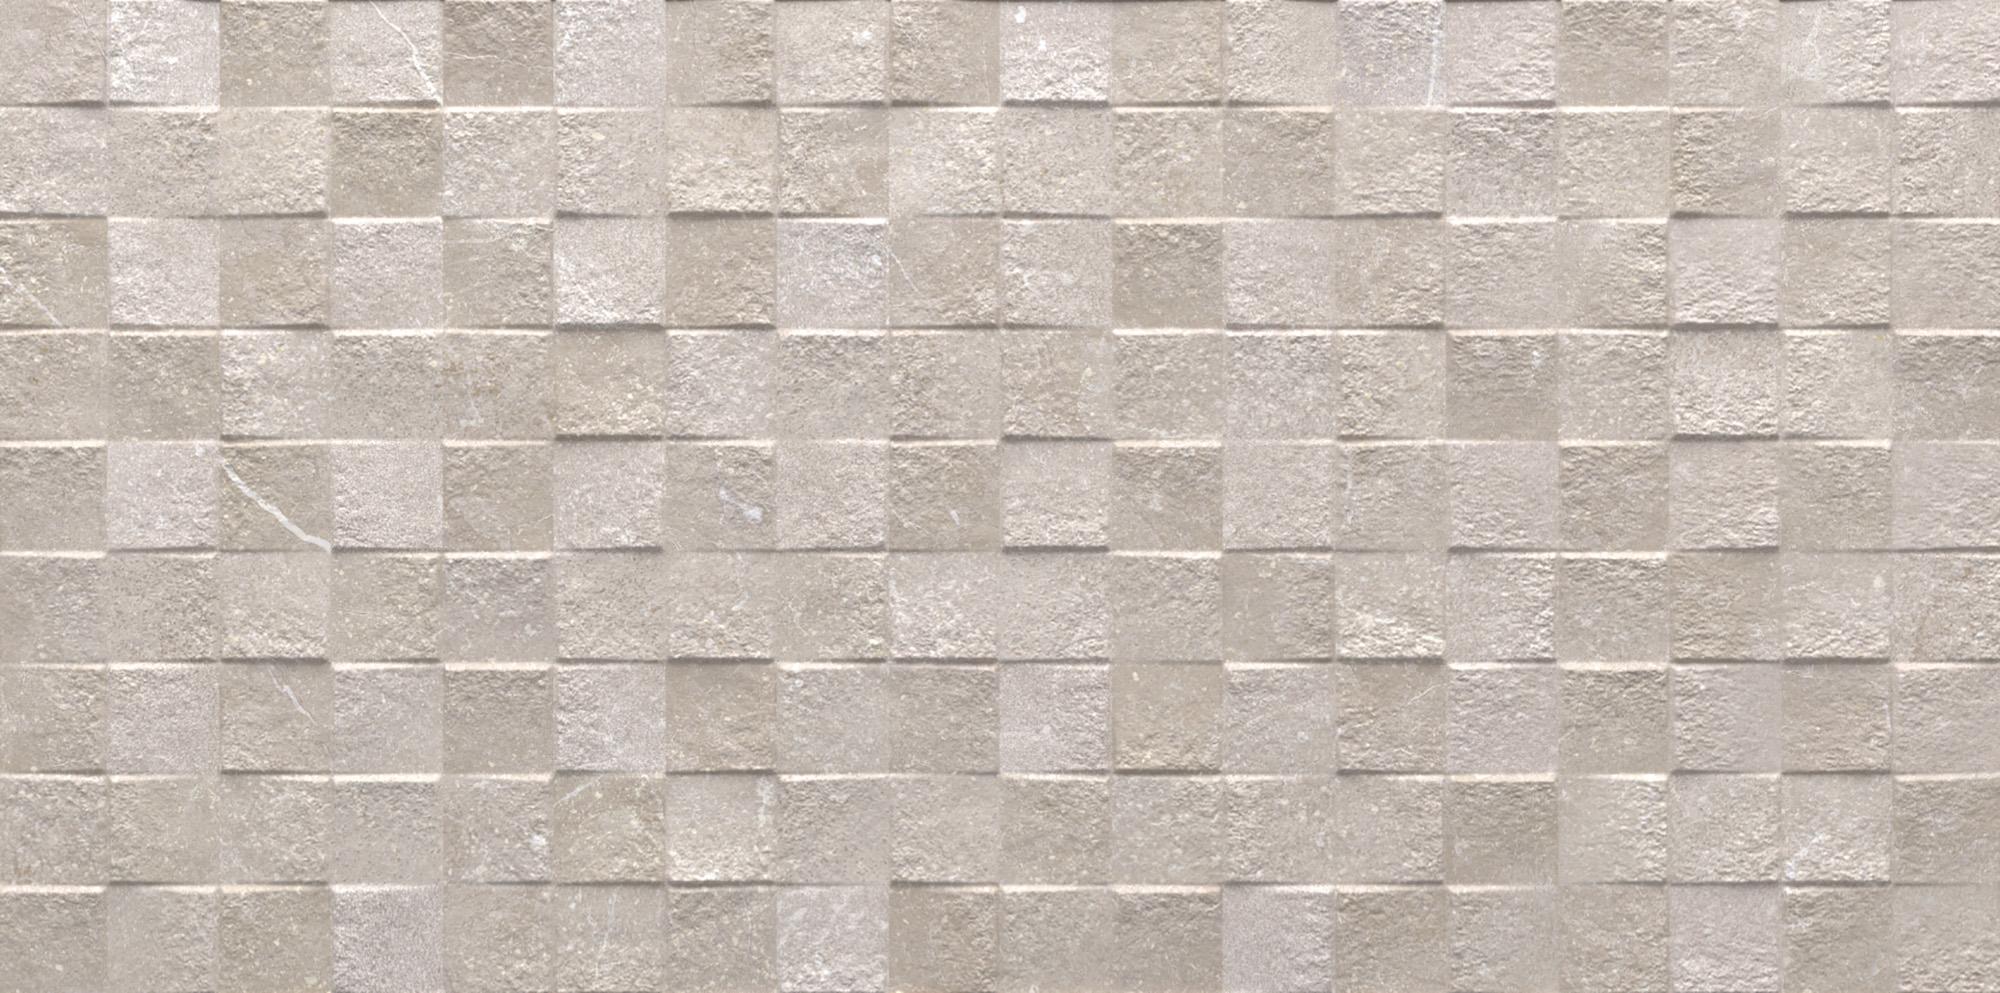 R3663F, Piazen, Vaaleanharmaa, seina